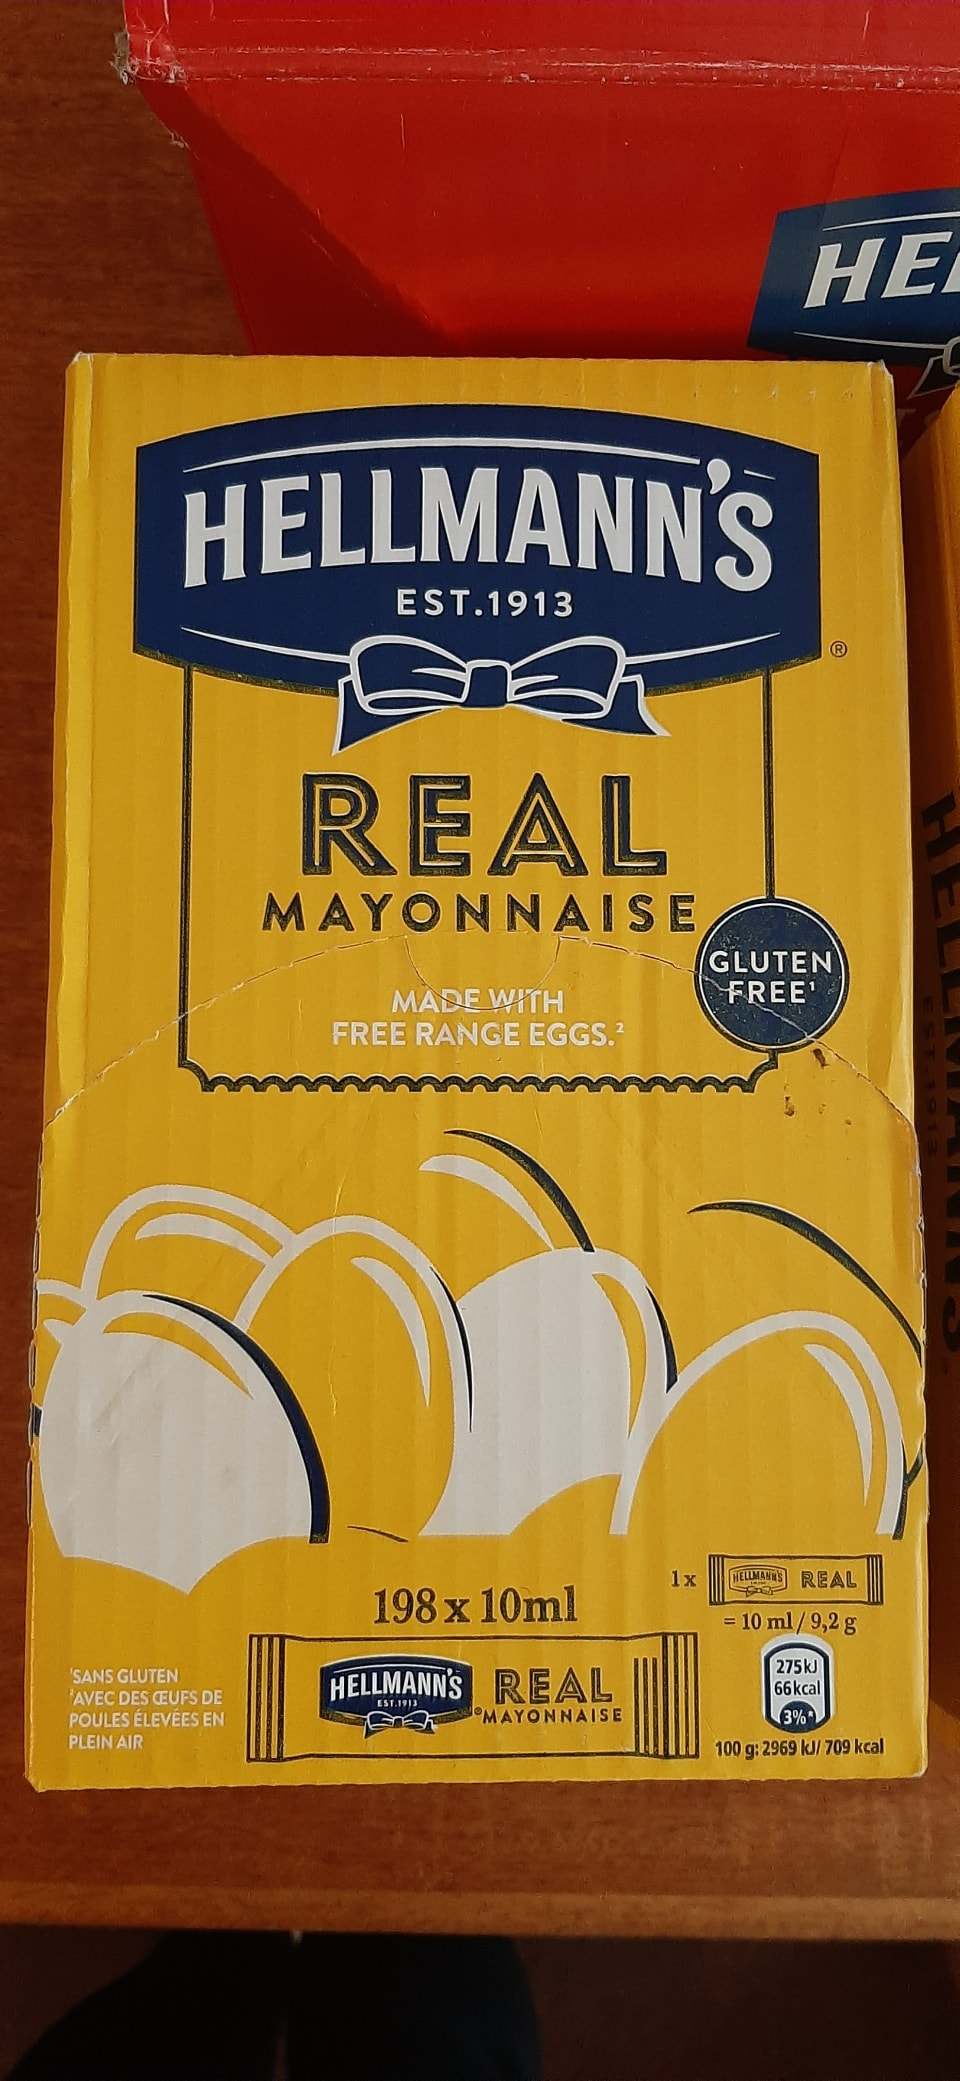 Hellmanns Mayonnaise sachets gluton free